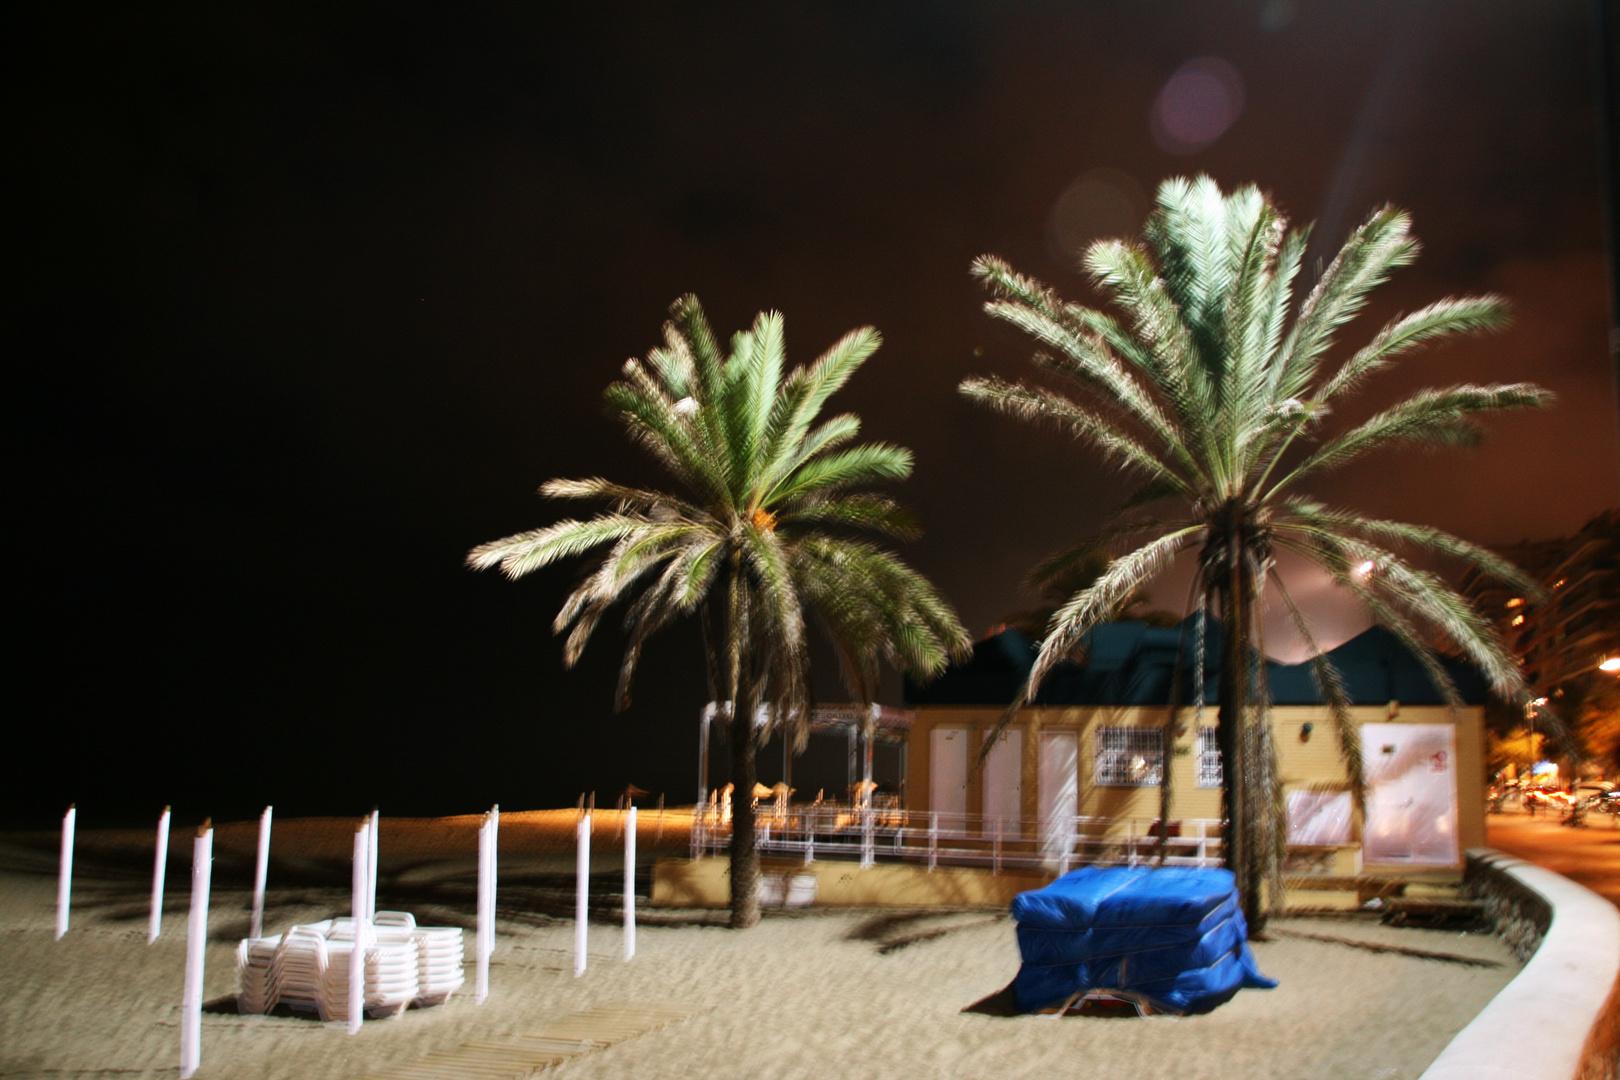 Nachts in Fuengirola scene 5